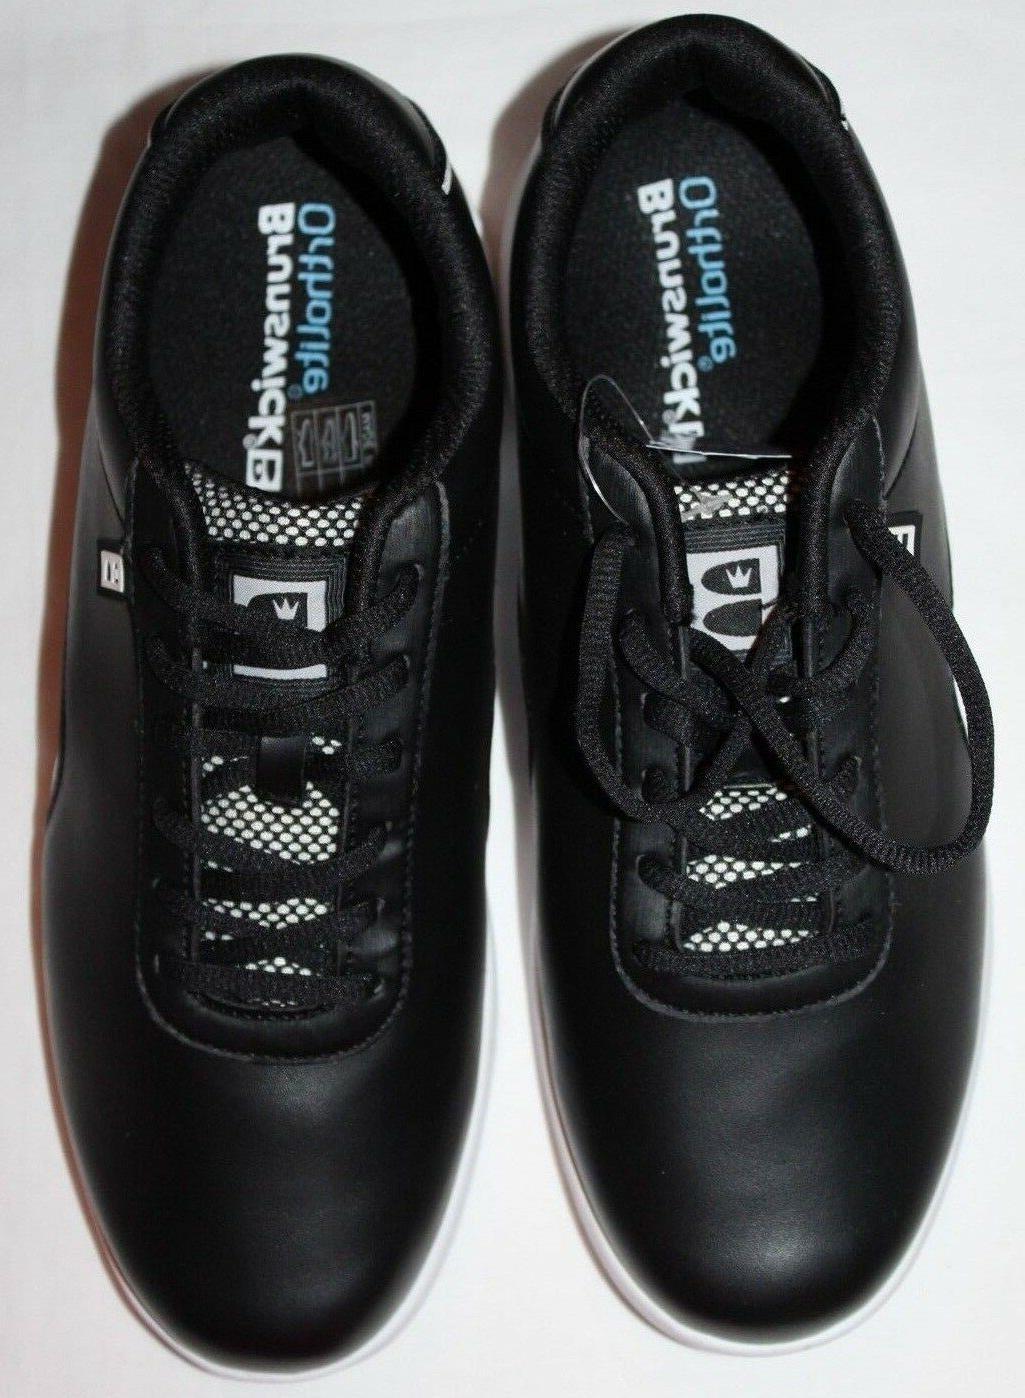 Brunswick Prelude Black Shoes Size 10.5 Medium